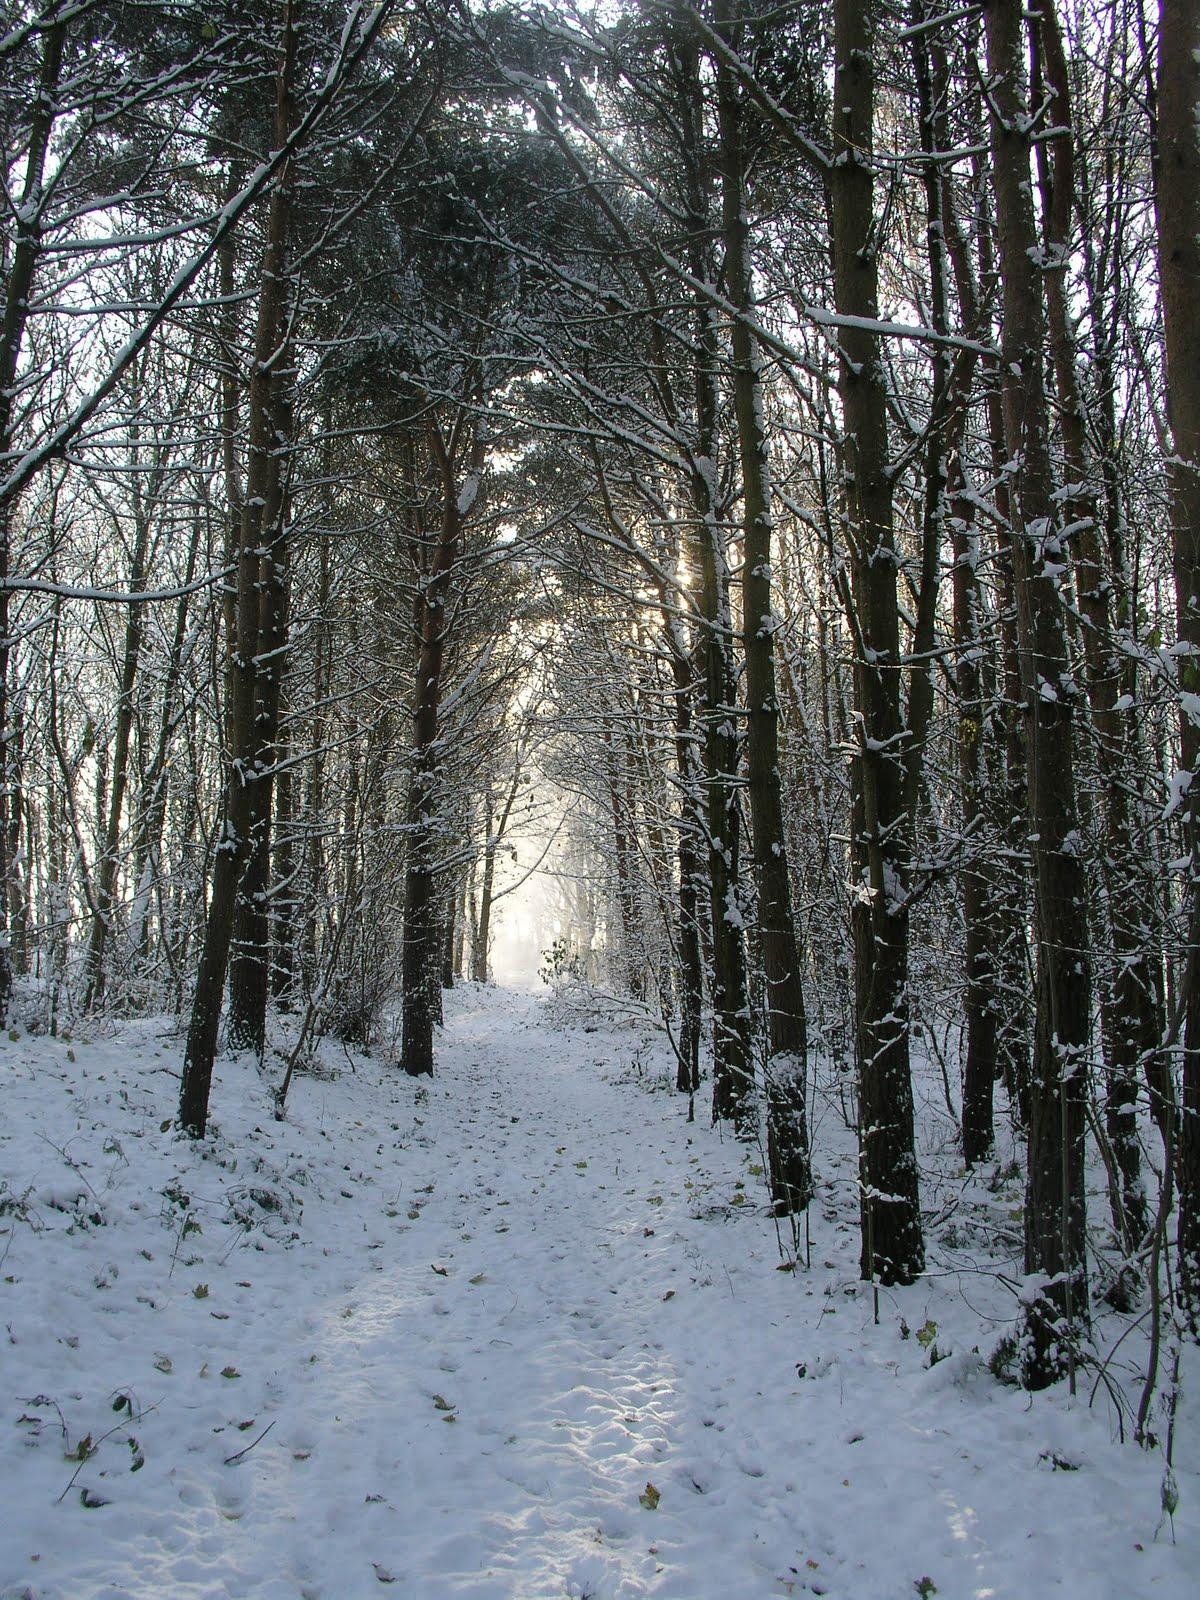 The Woods Wood Be Quiet If No Birds Sang Except The Best: TenHornedBeast: Winter Woods: Tunnels Of Light